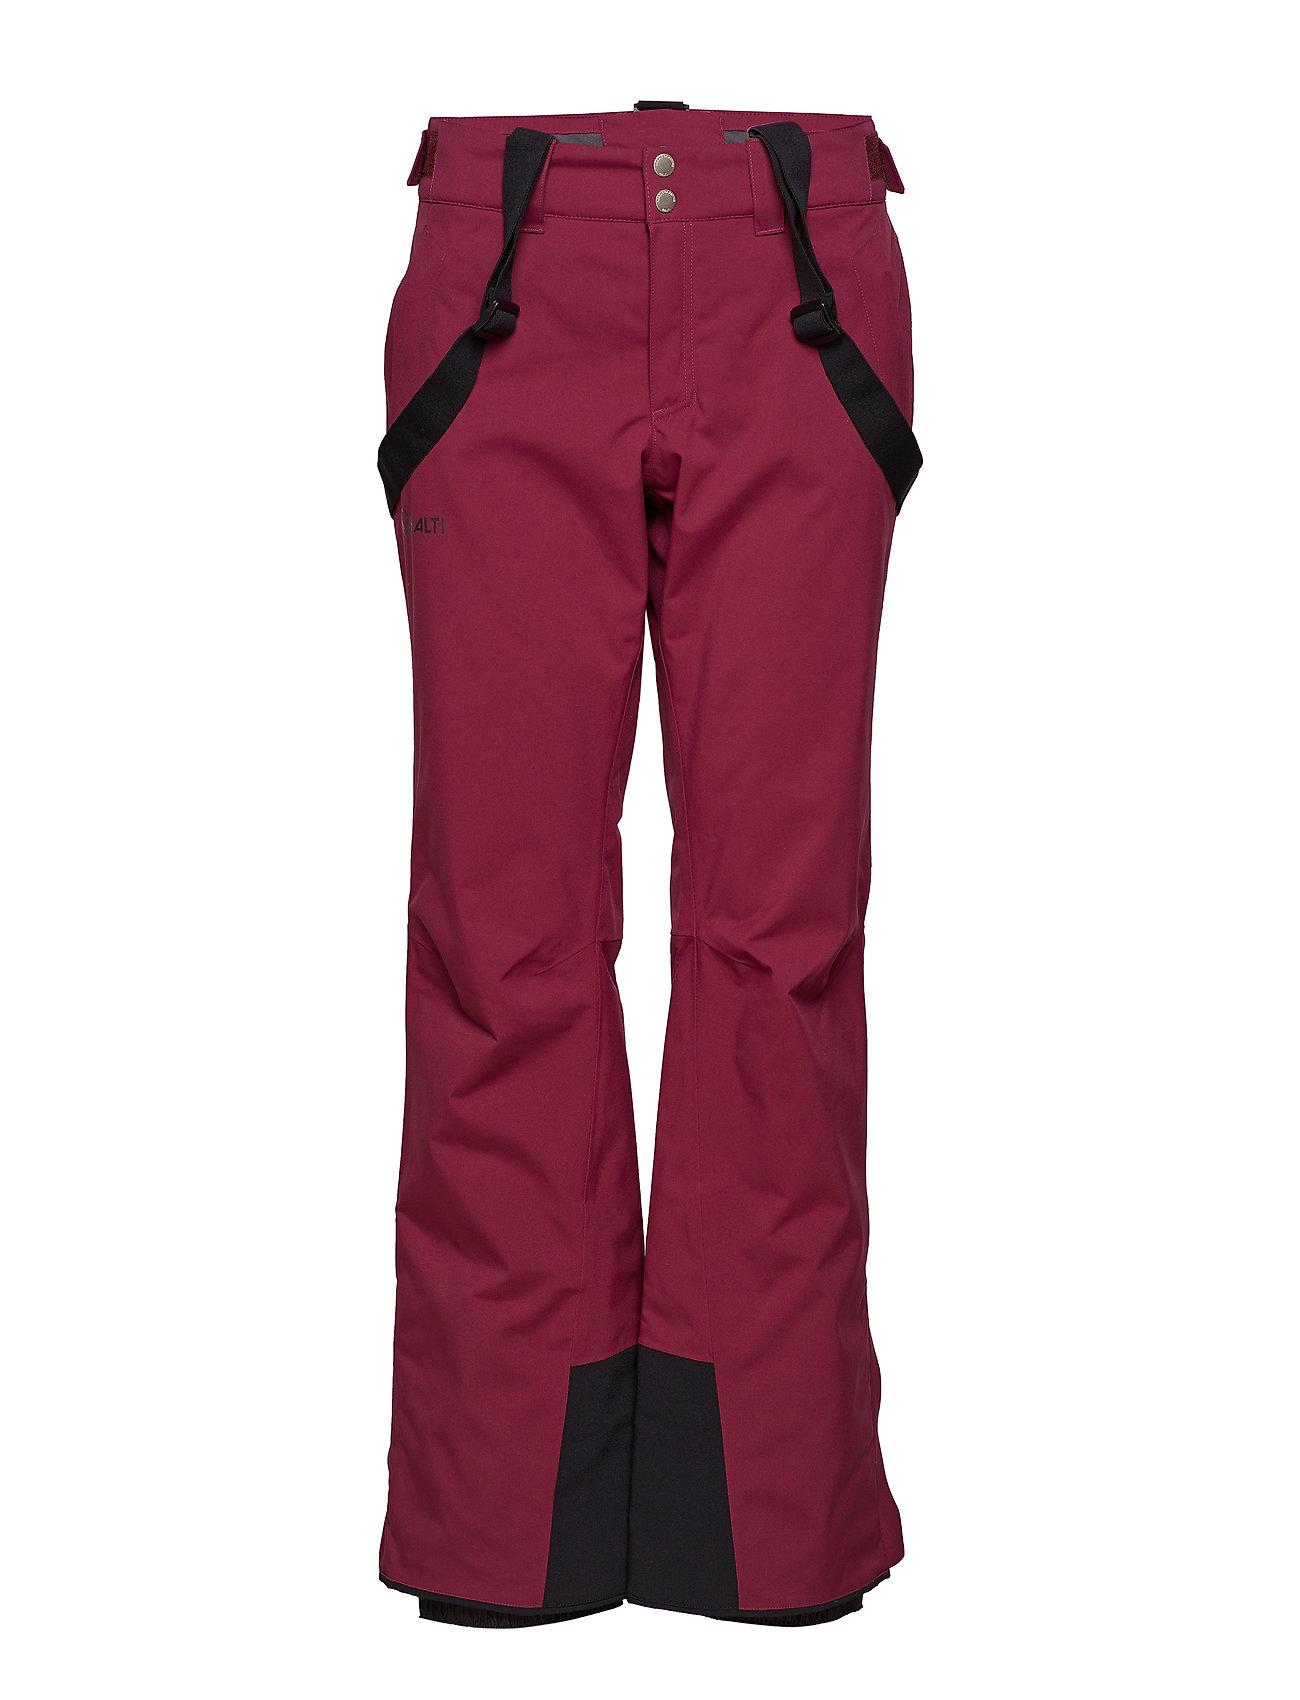 Halti Puntti II W DX ski pants - PLUM PURPLE